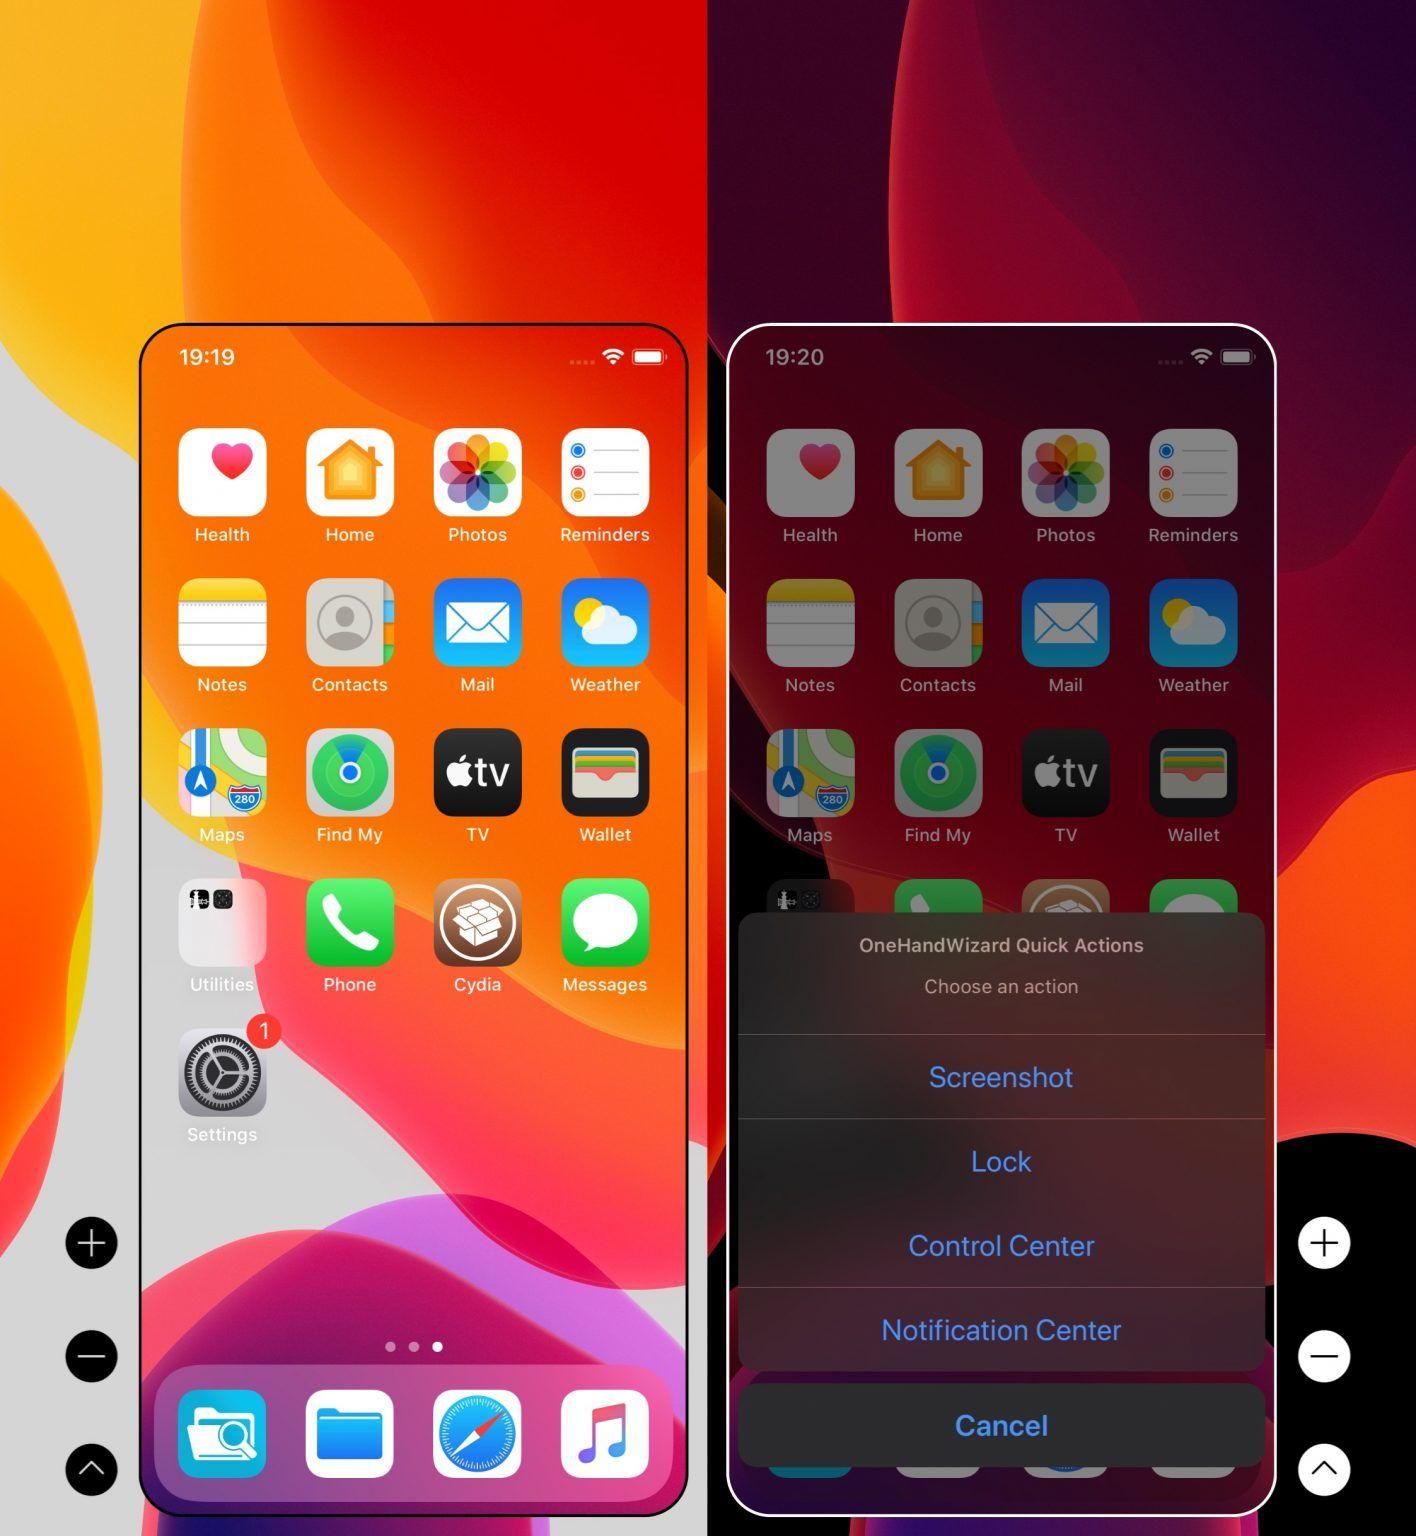 Onehandwizard 2 Makes One Handed Usage Of Massive Iphones Easier